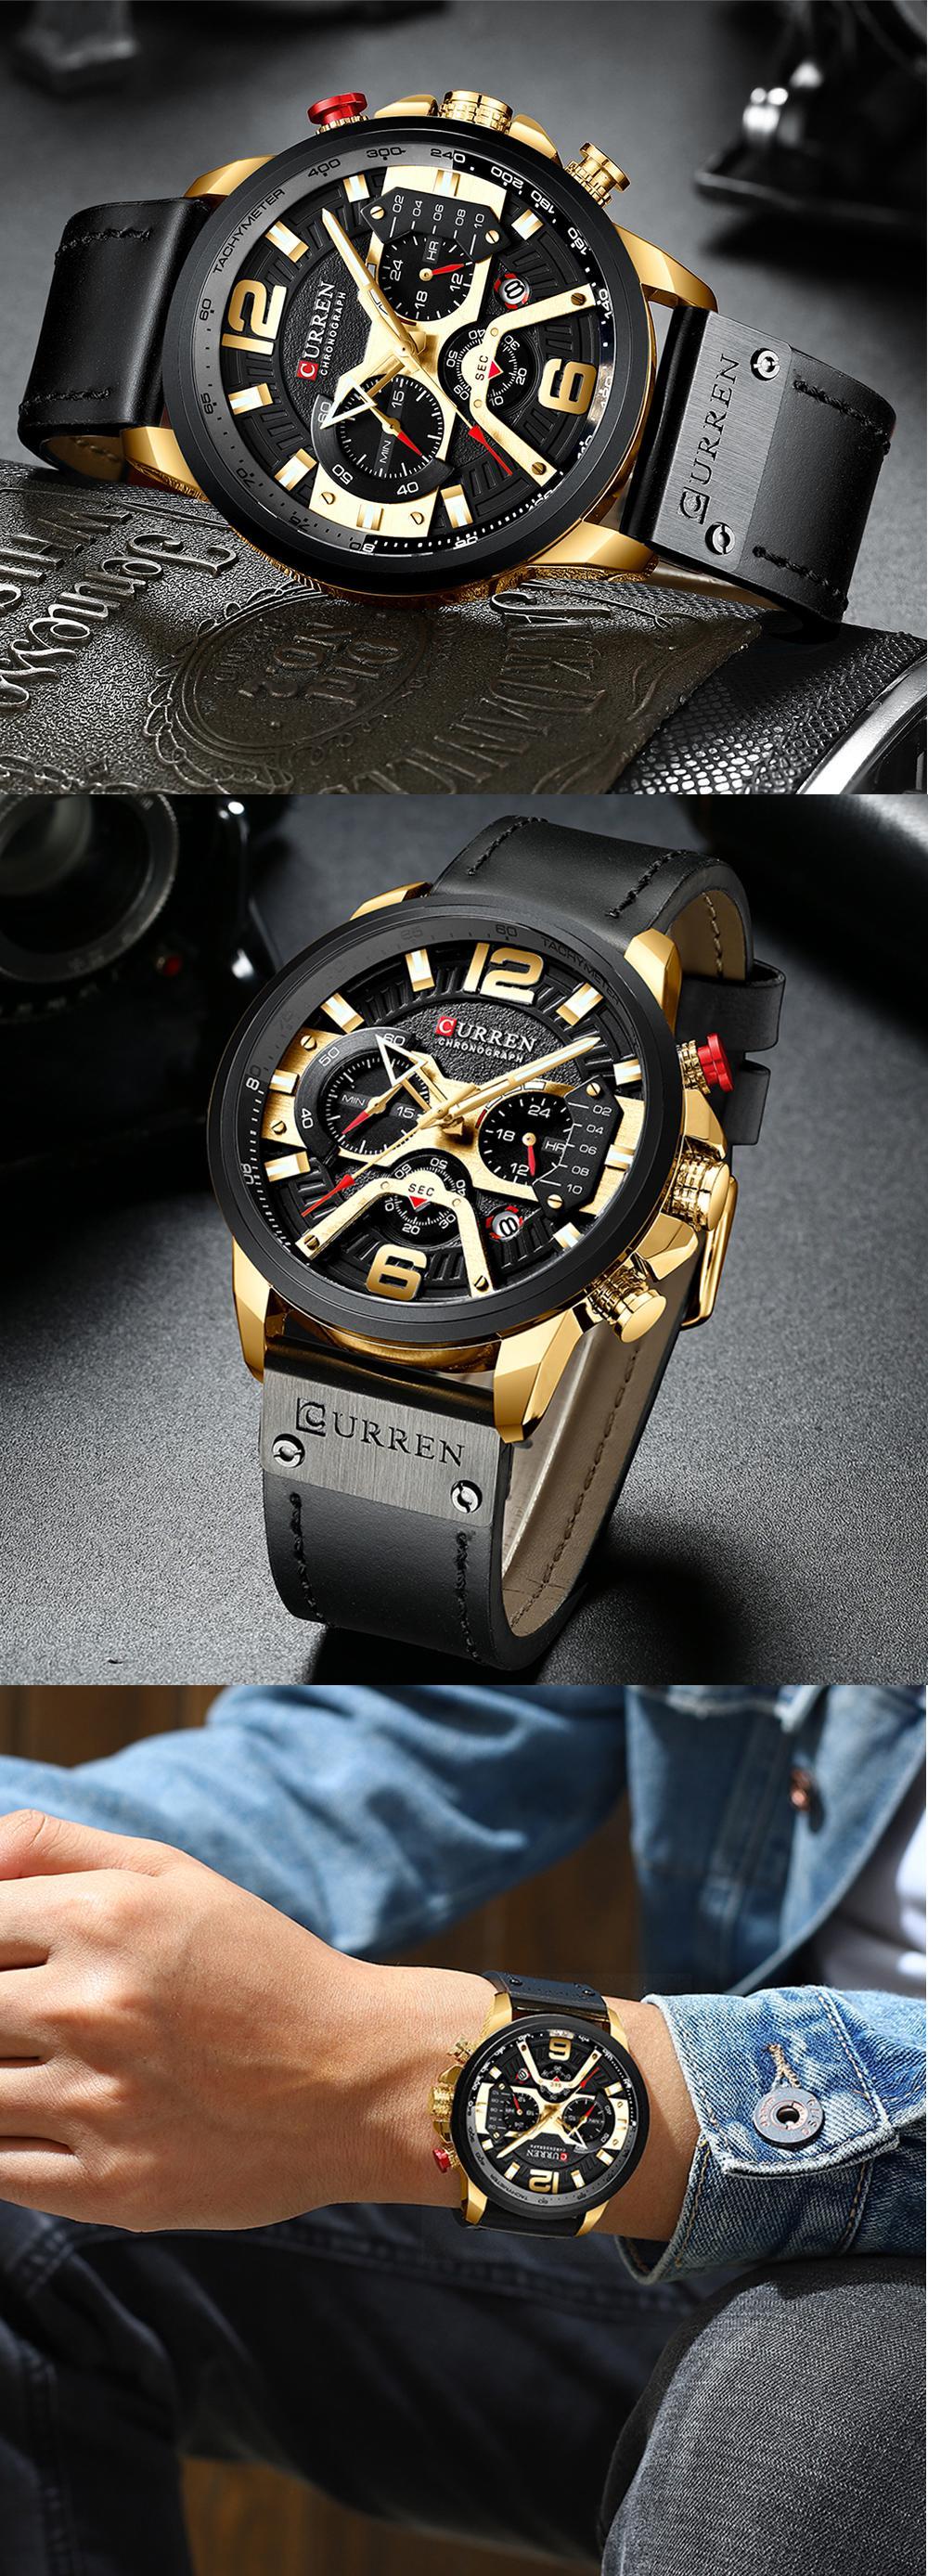 ZHANGZZ Hermoso Reloj Curren, 8142 Reloj de Calendario Reloj